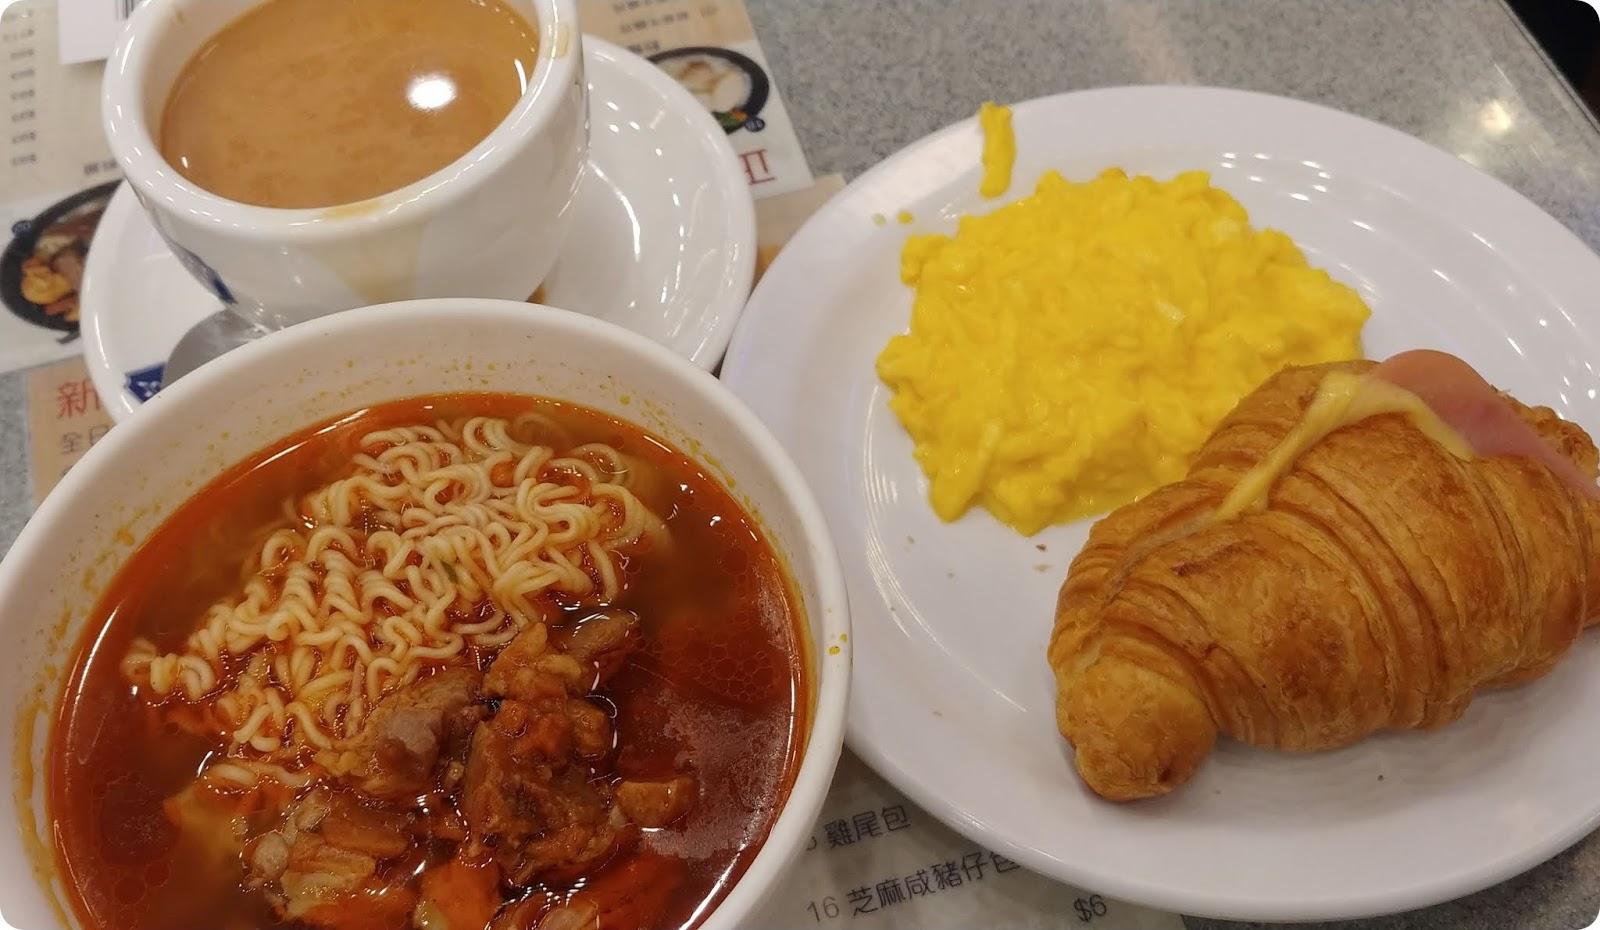 Babymama: 翠河餐廳 @ 官塘 ( 10-FEB-2019 )